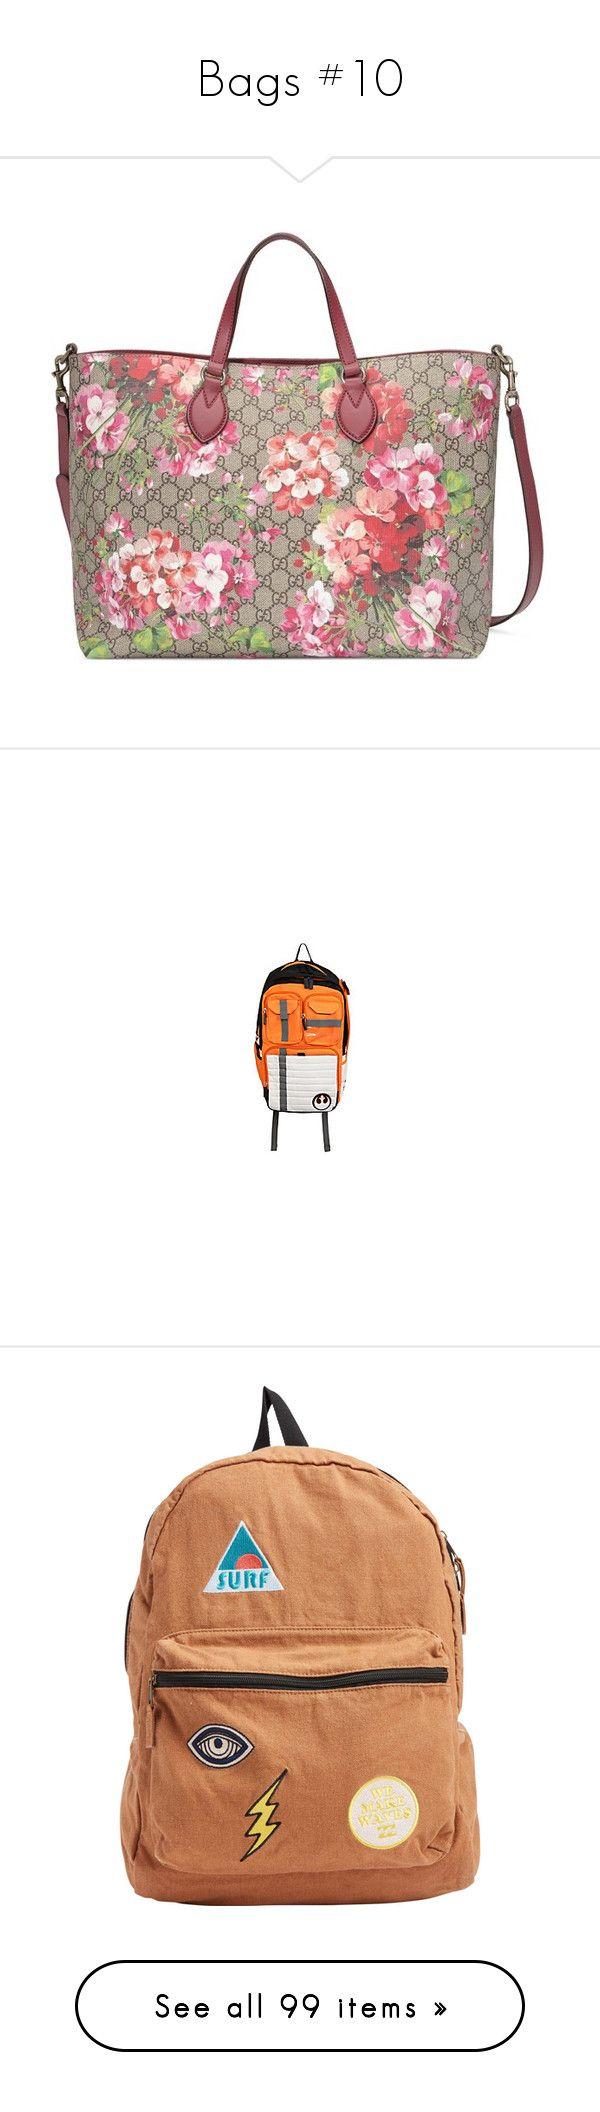 """Bags #10"" by banana-lee ❤ liked on Polyvore featuring bags, handbags, tote bags, gucci, tote handbags, canvas totes, tote purses, gucci handbags, backpacks and orange backpack"